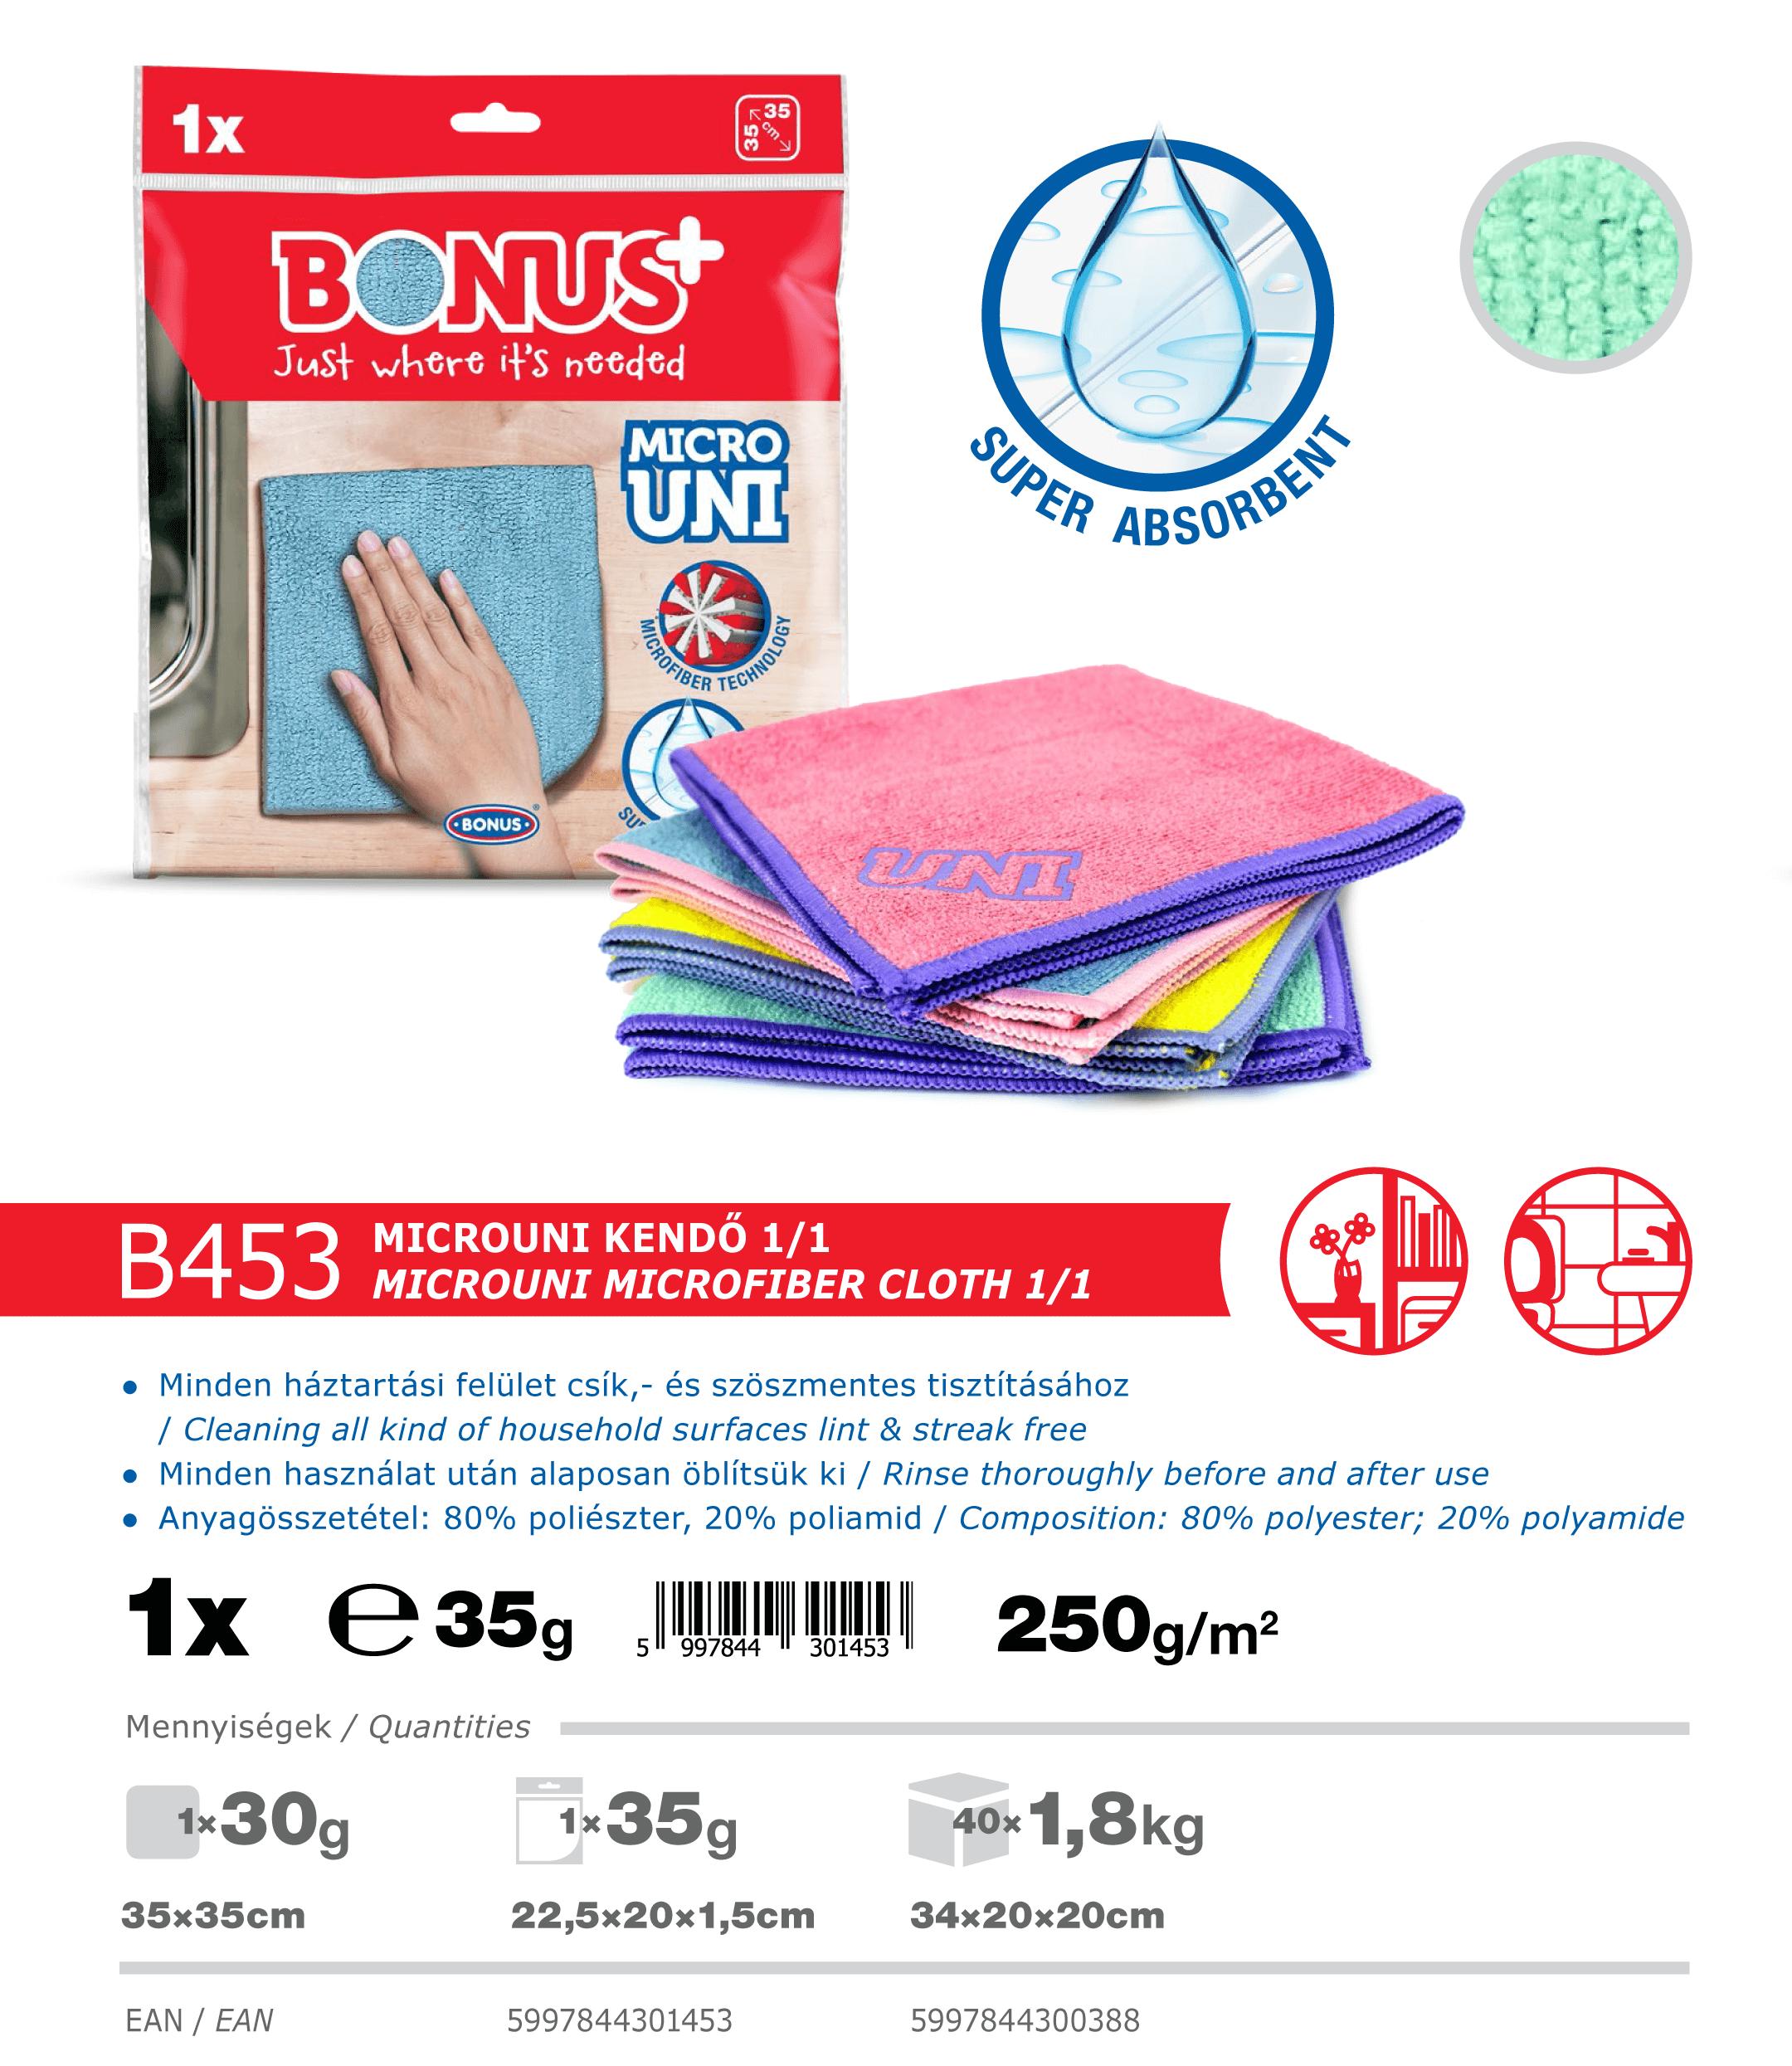 B453 Bonus+ microUNI kendő 1/1 katalógus adatok